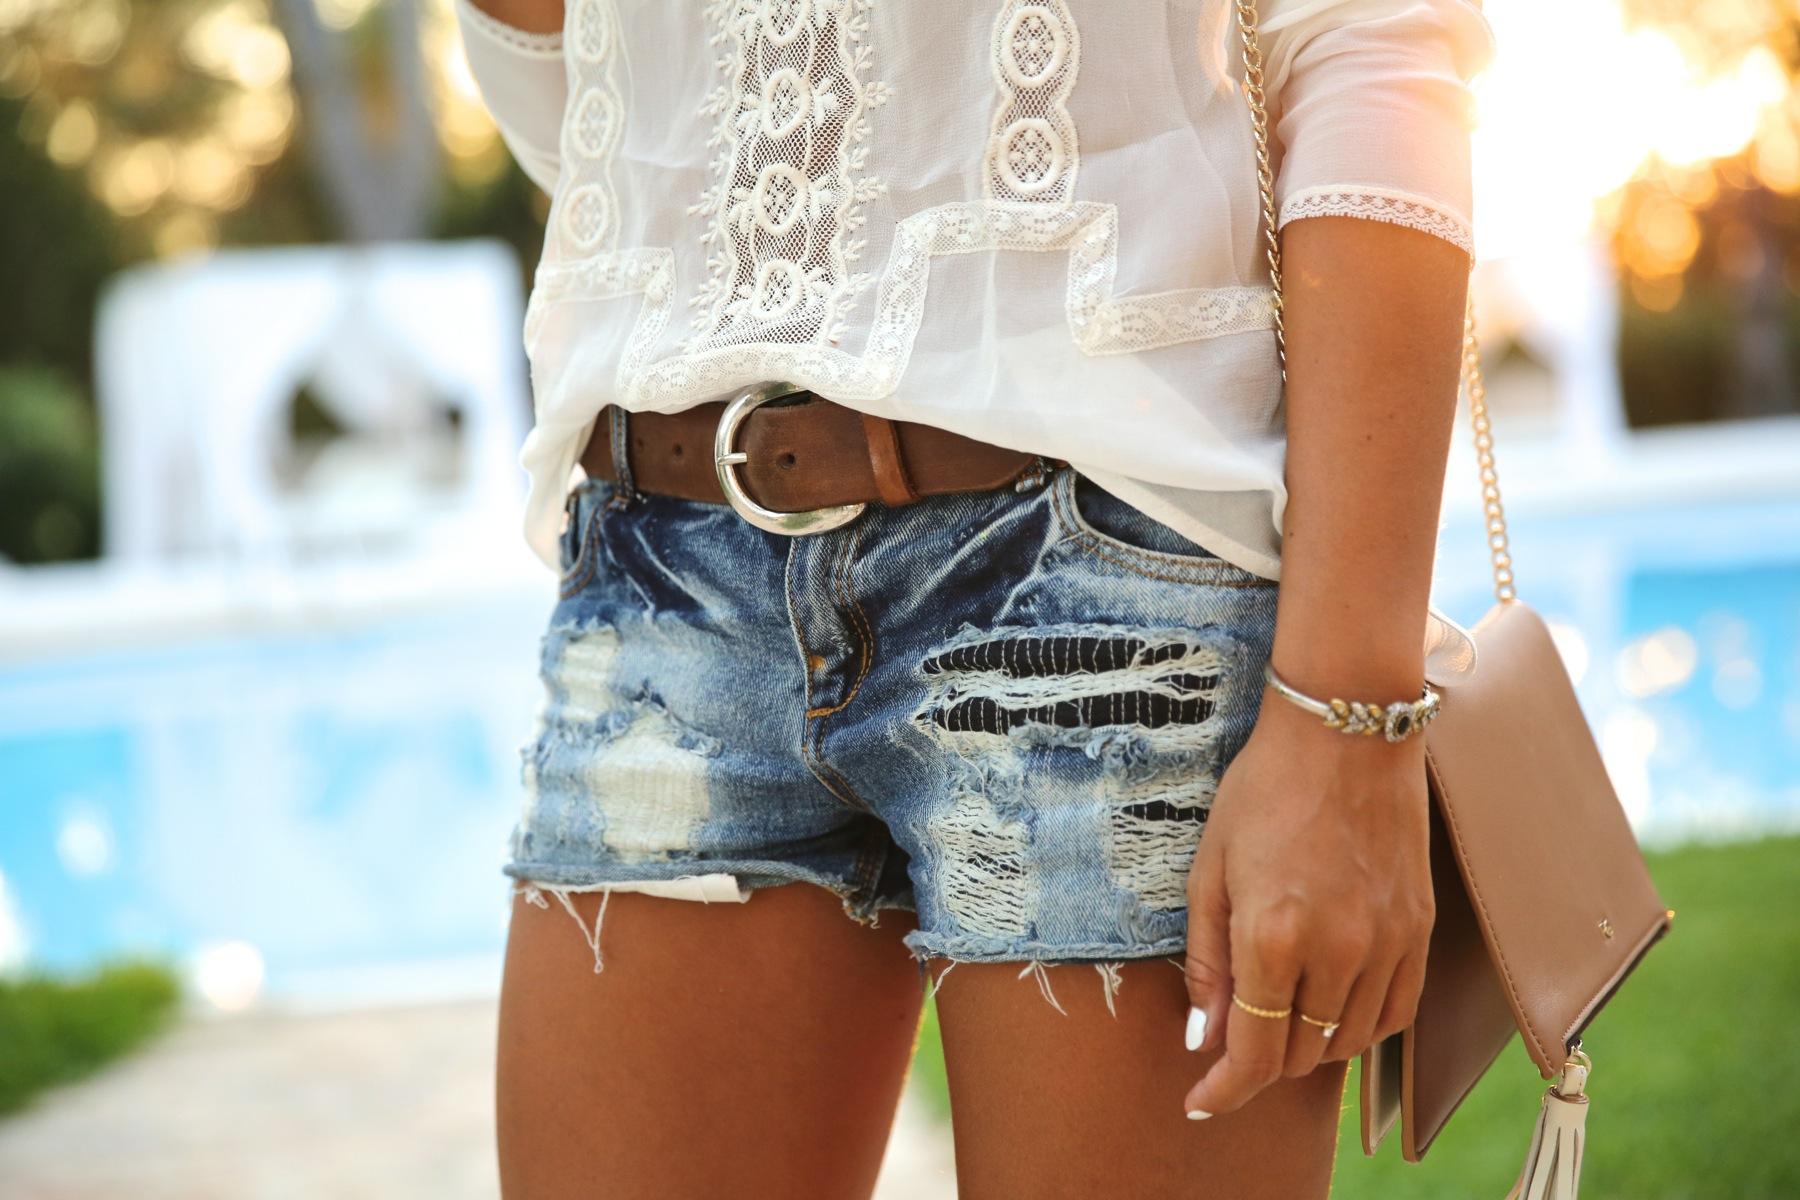 trendy_taste-look-outfit-street_style-ootd-blog-blogger-fashion_spain-moda_españa-boho-hippie-denim_shorts-shorts_vaqueros-blusa-blouse-mas34-pg-ibiza-sa_talaia-2